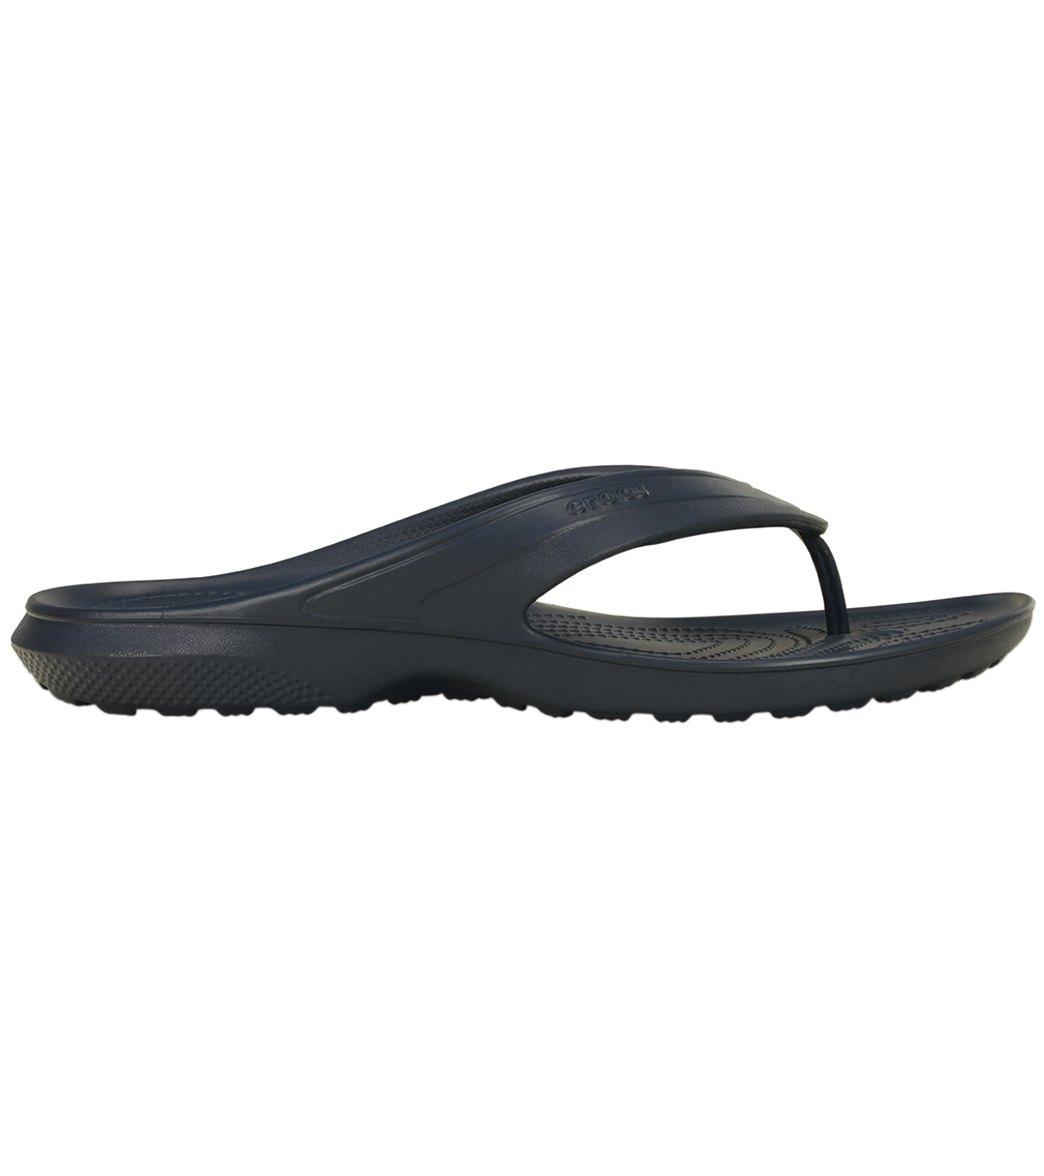 46ea87ac153 Crocs Unisex Classic Flip Flop at SwimOutlet.com